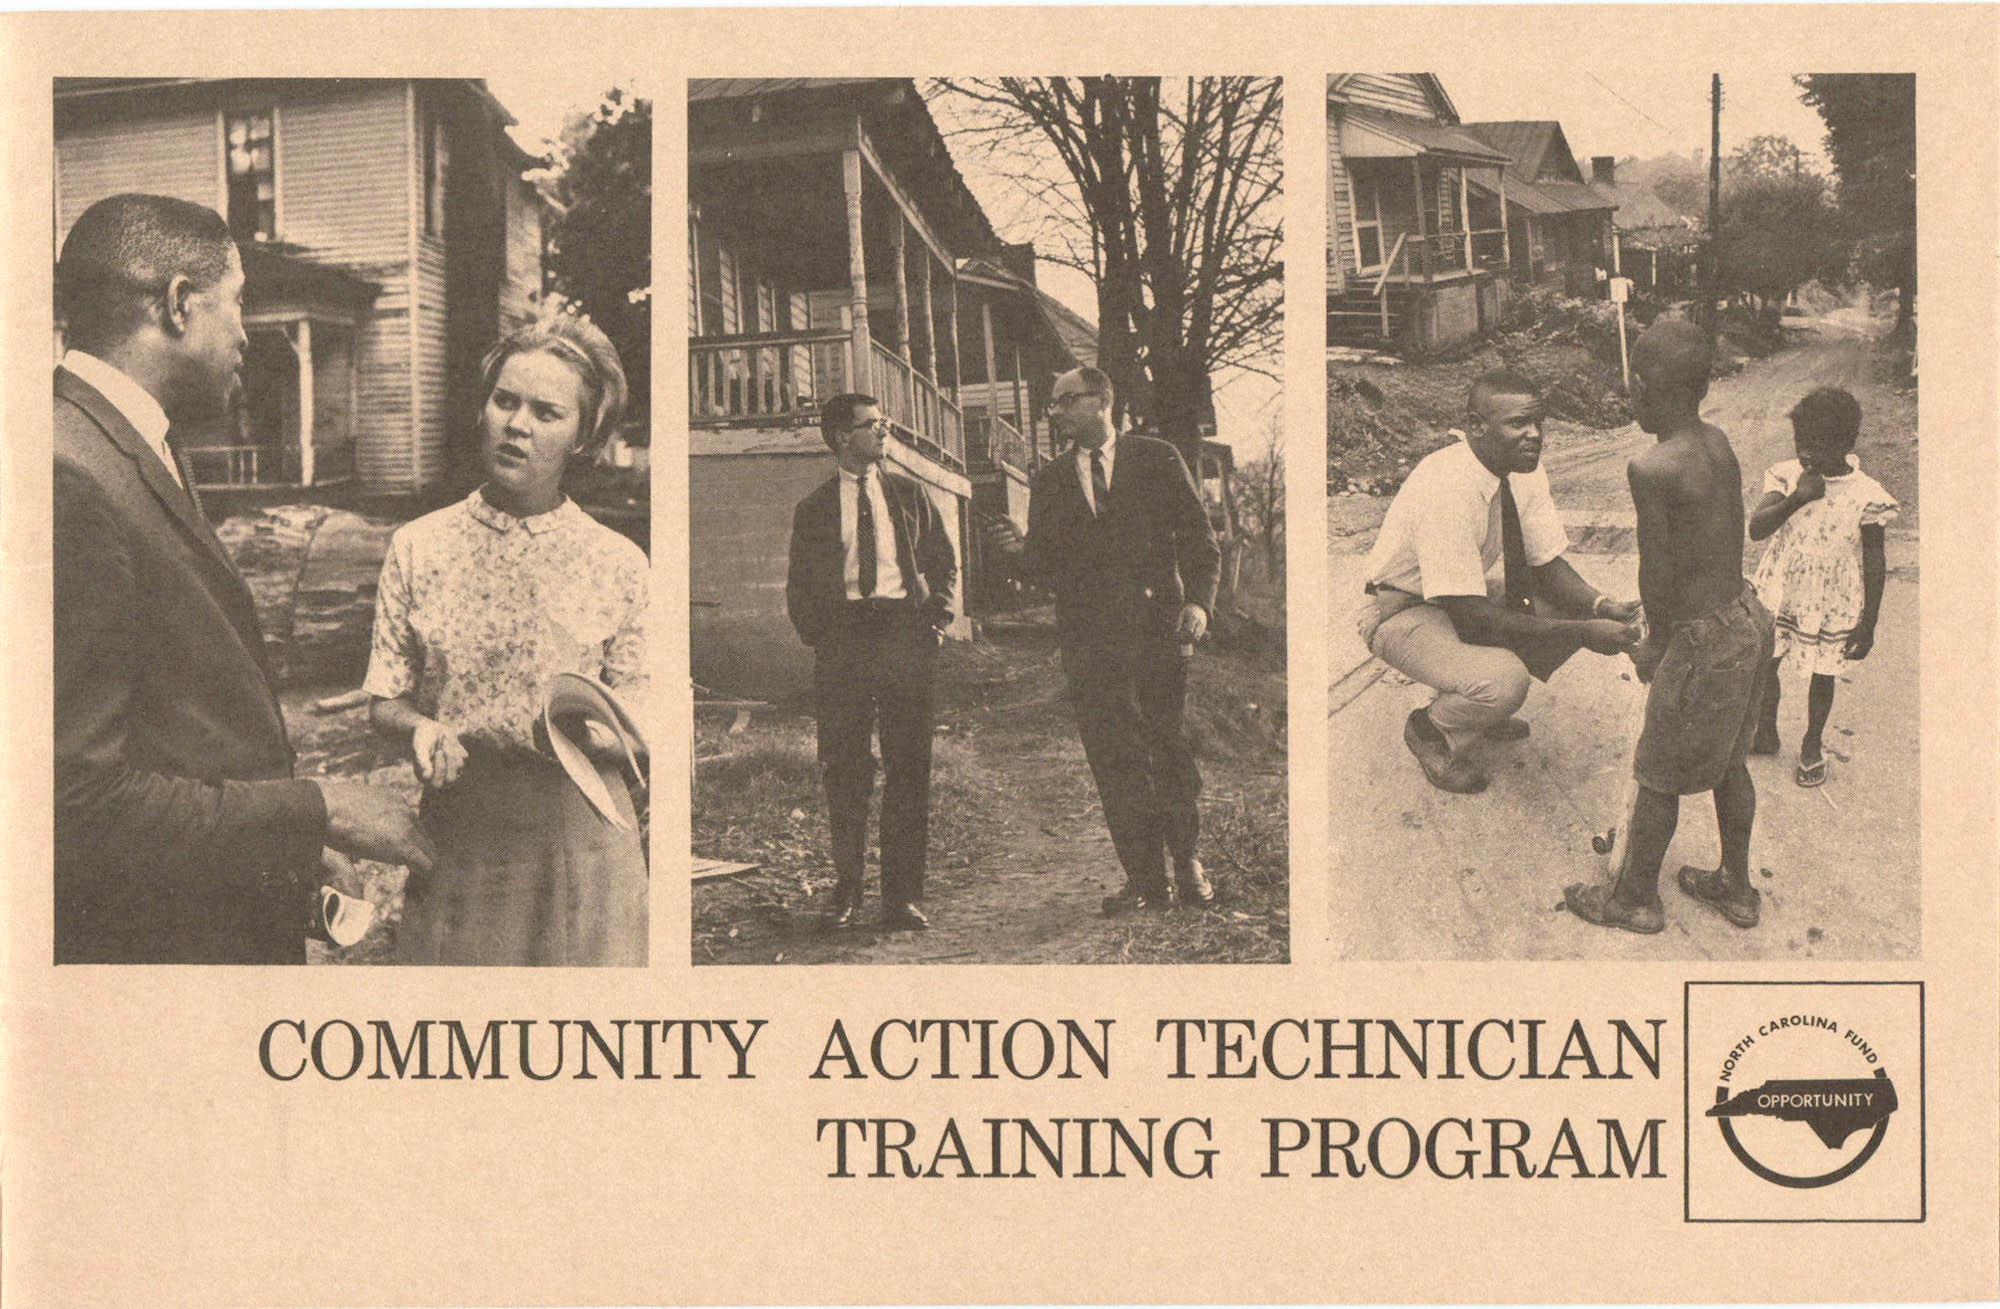 Community Action Technician Training Program